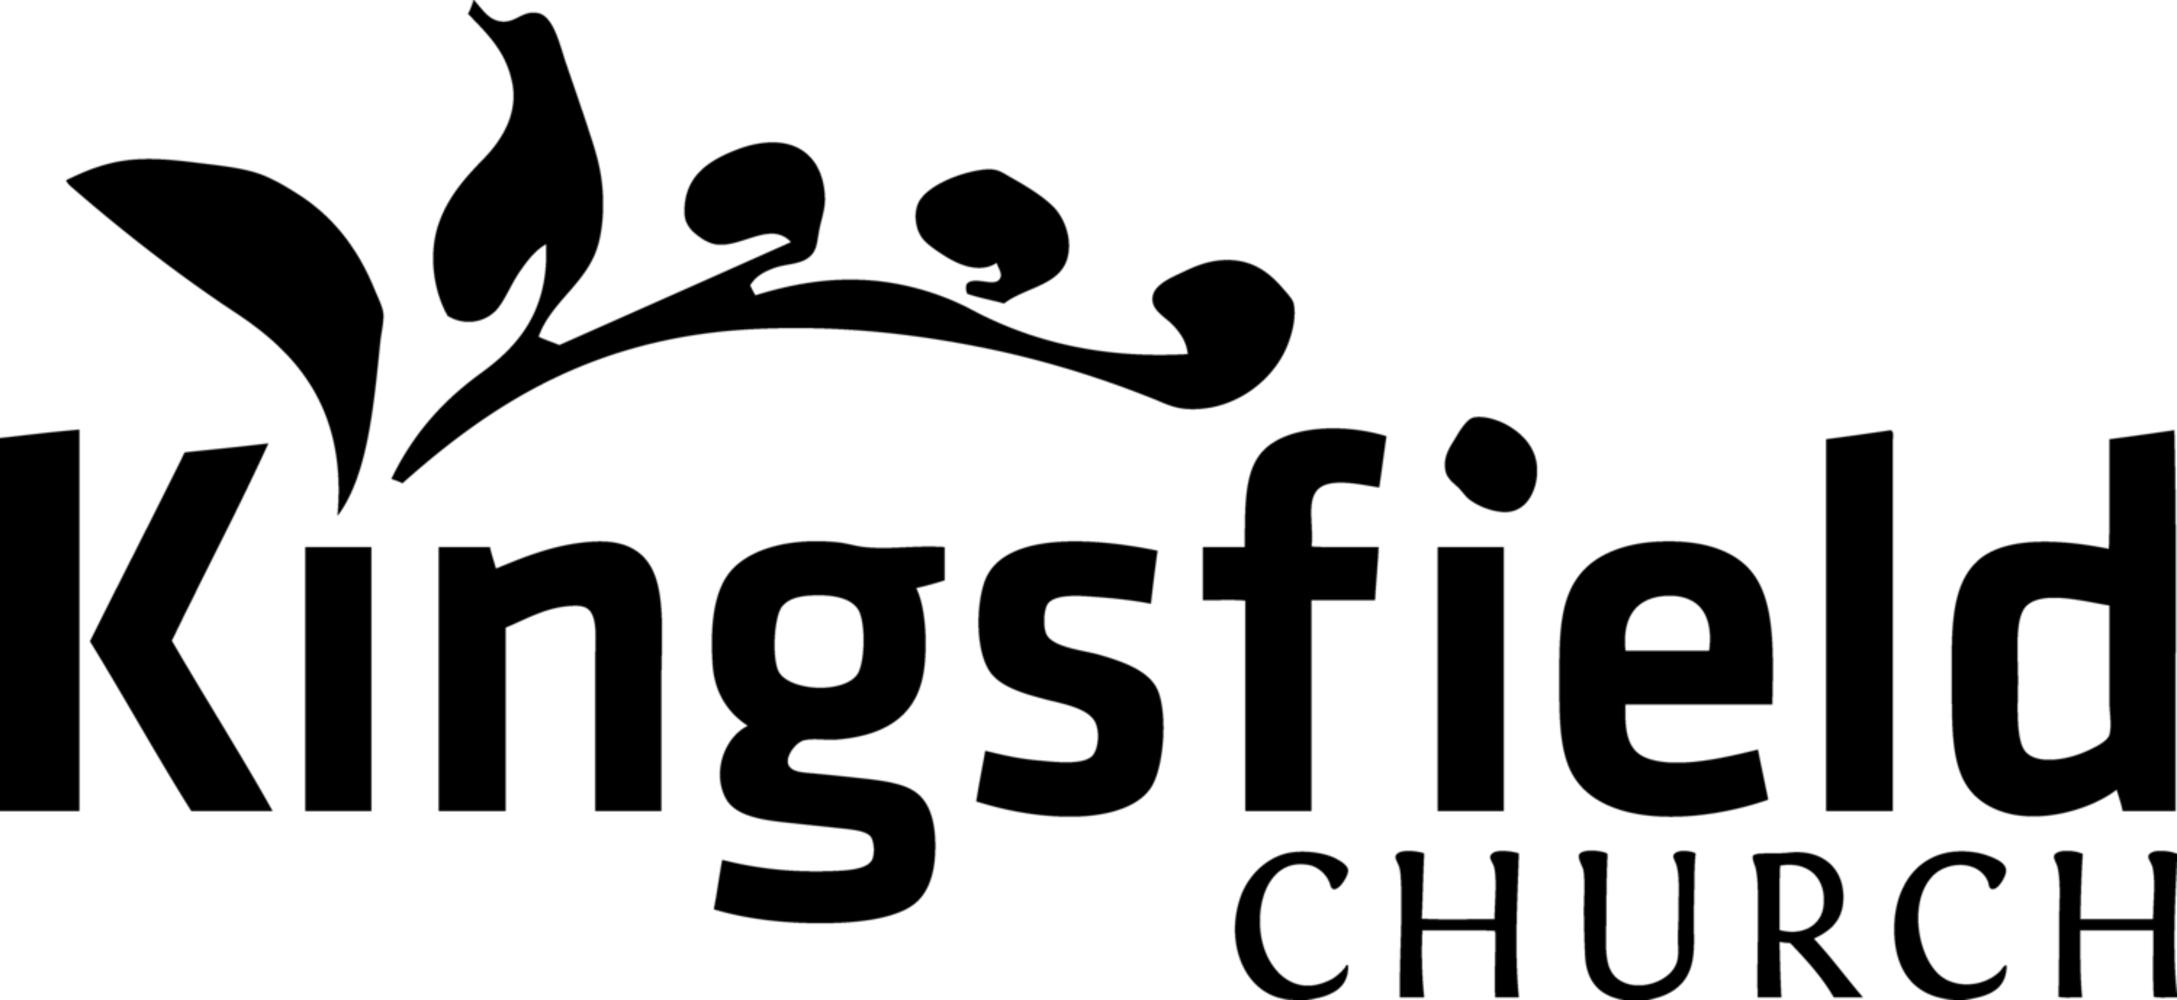 Assets of Church - Audio & Lighting Equipment, Electronics & Furniture